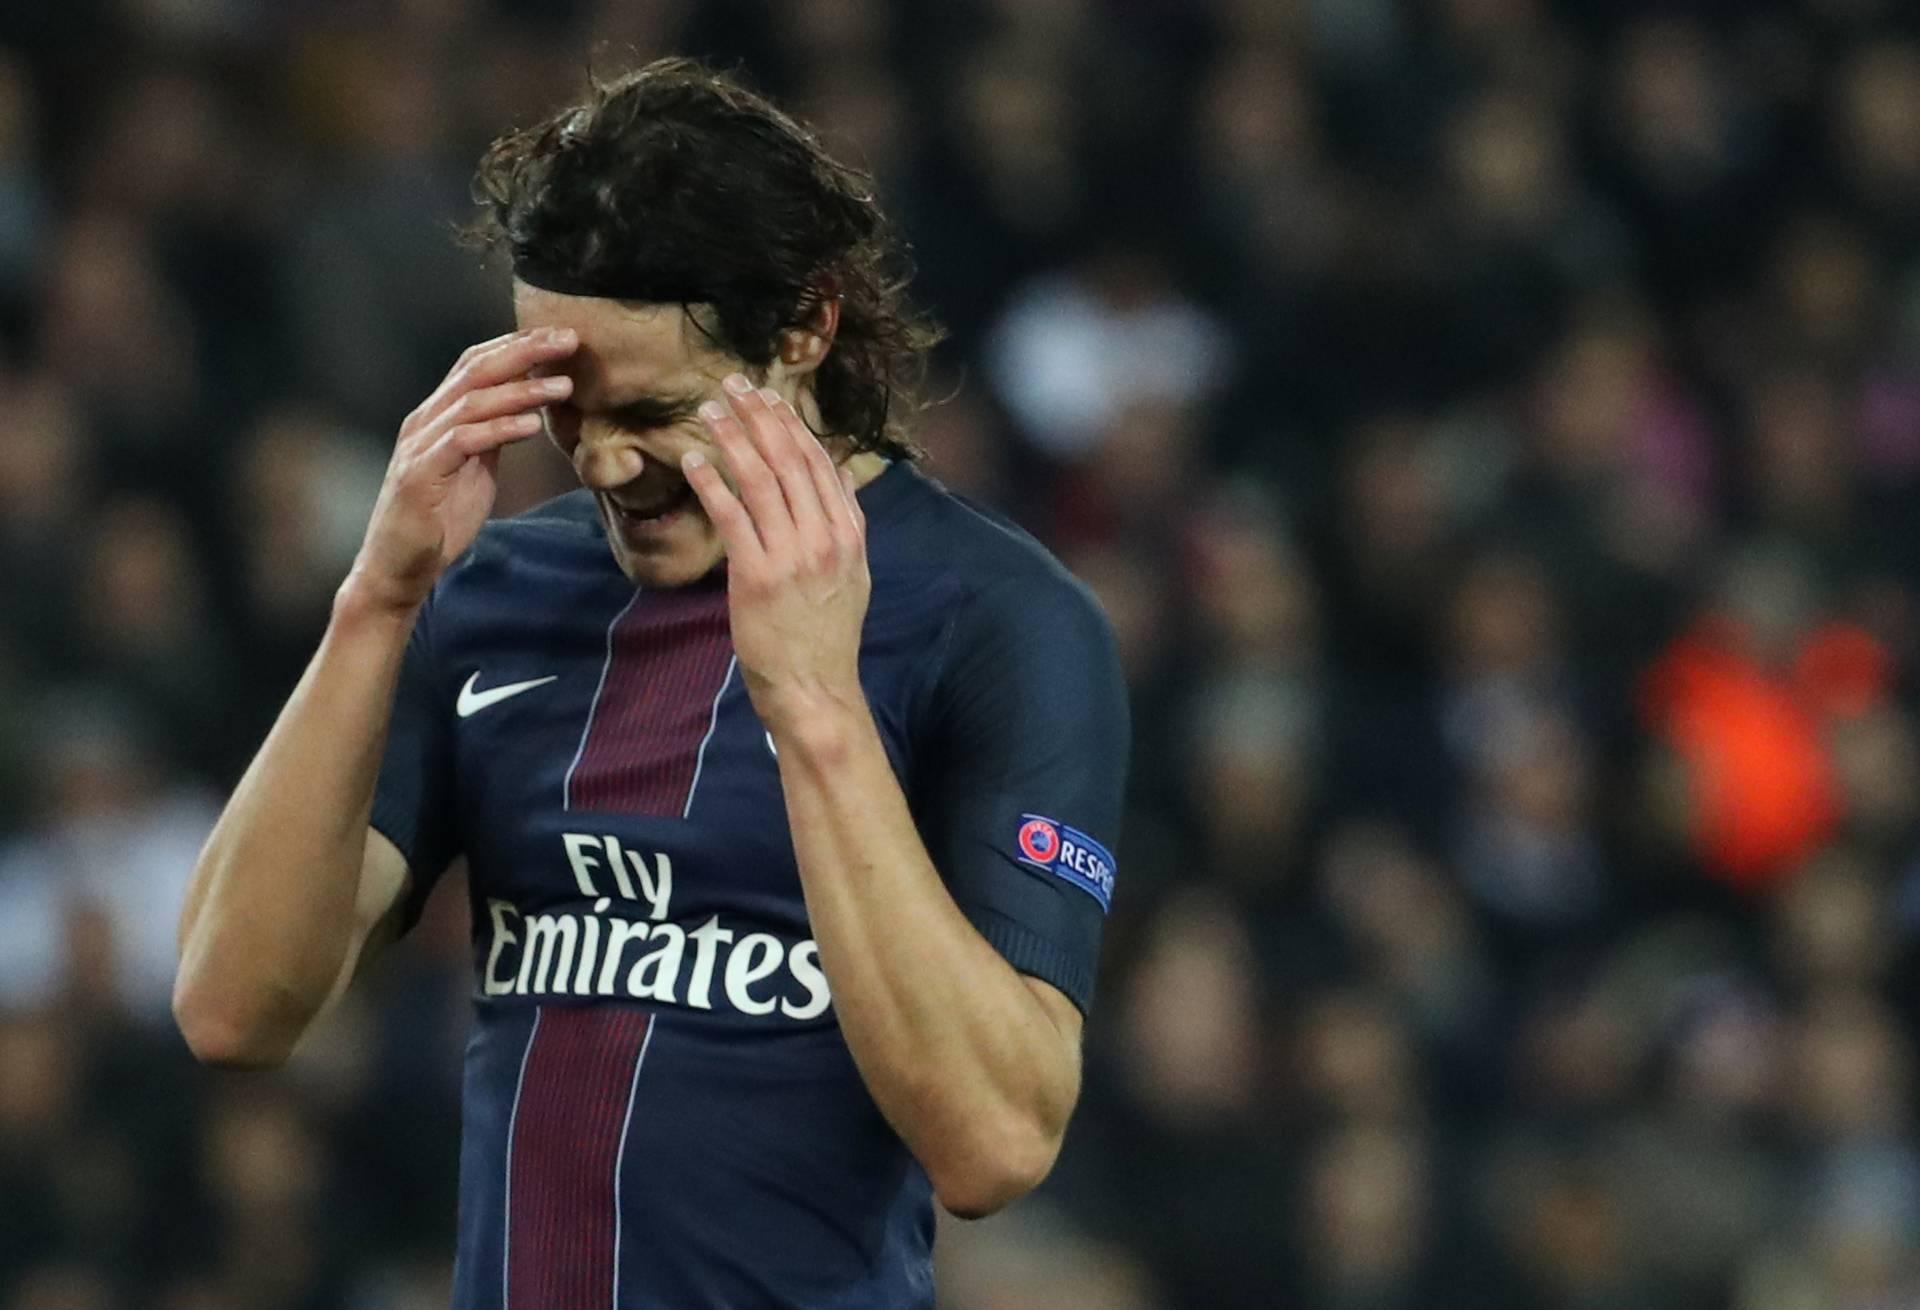 Paris Saint-Germain's Edinson Cavani looks dejected